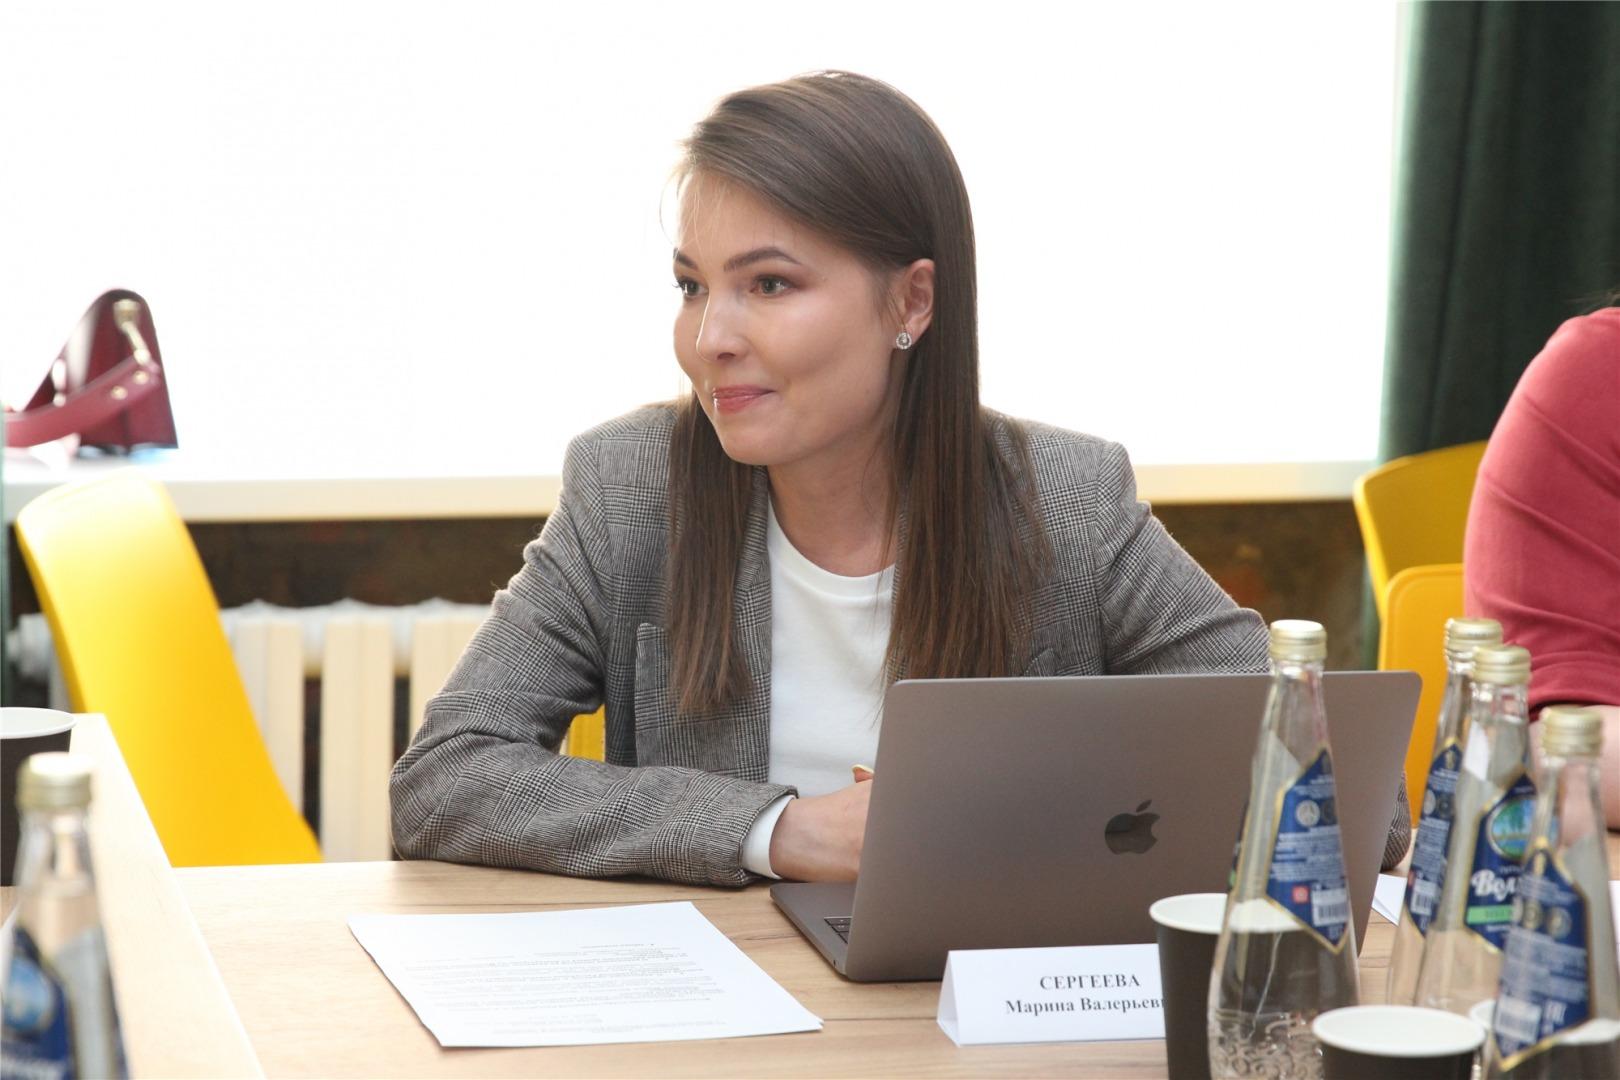 Координатор проекта благоустройства Чебоксар Марина Сергеева